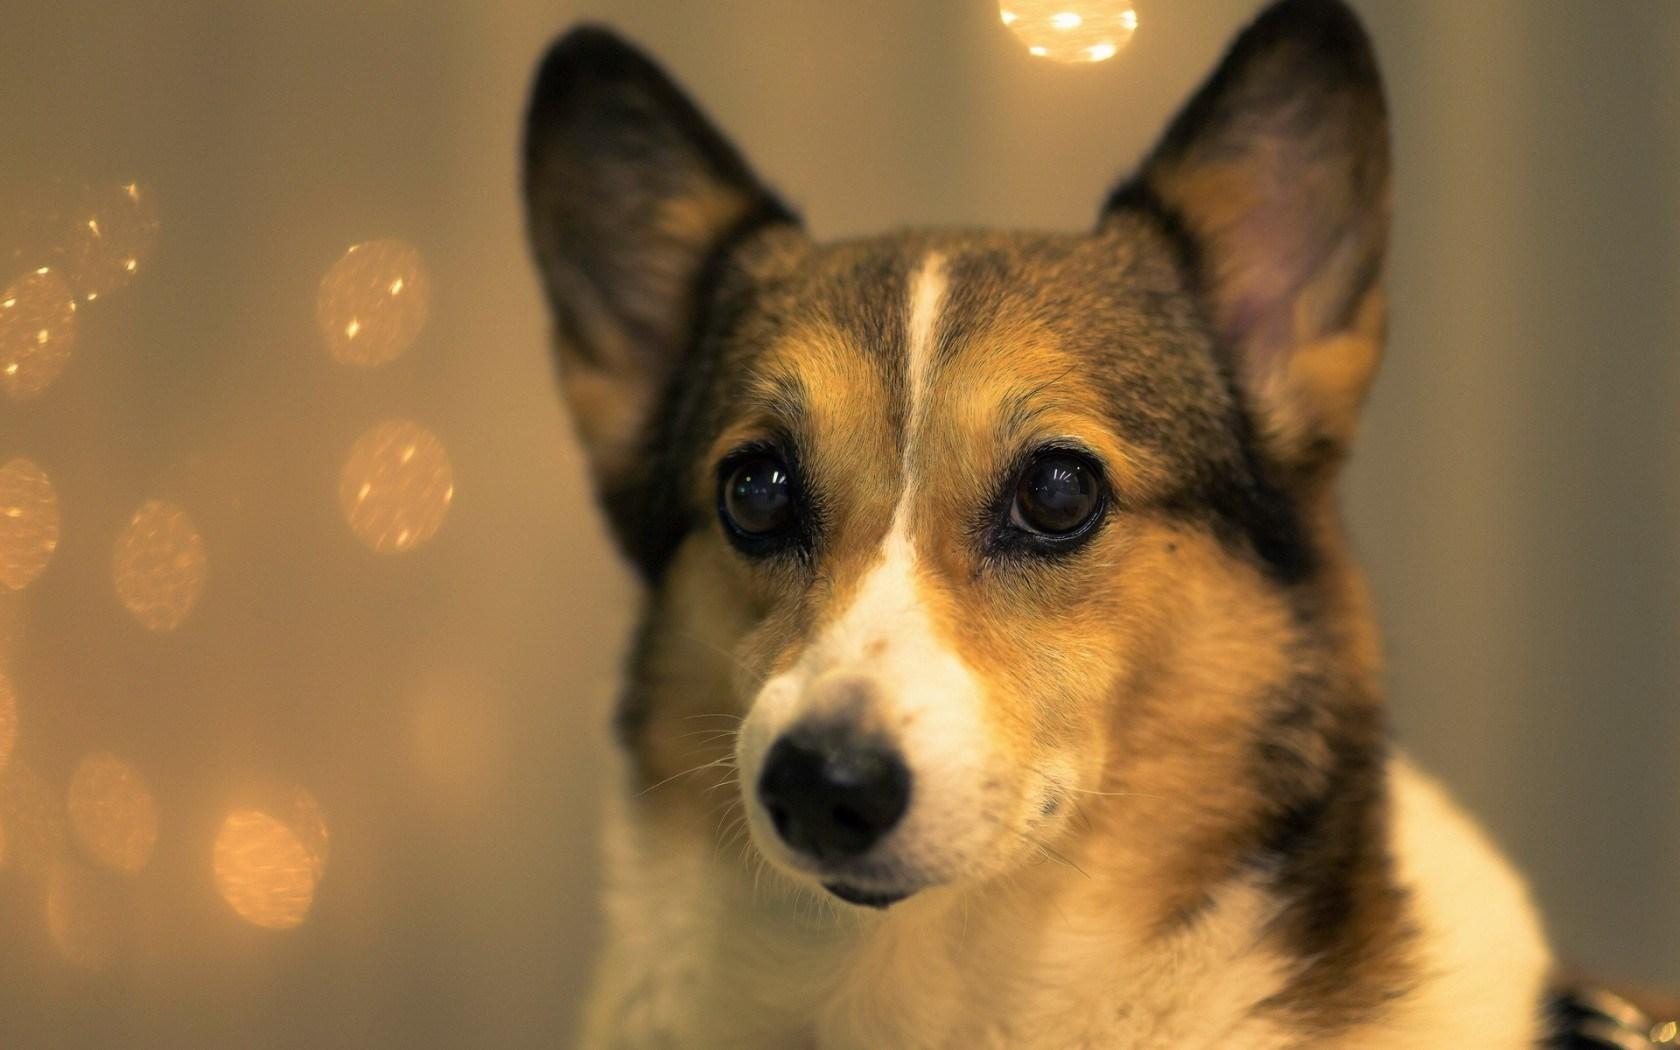 Dog Friend Look Close-Up